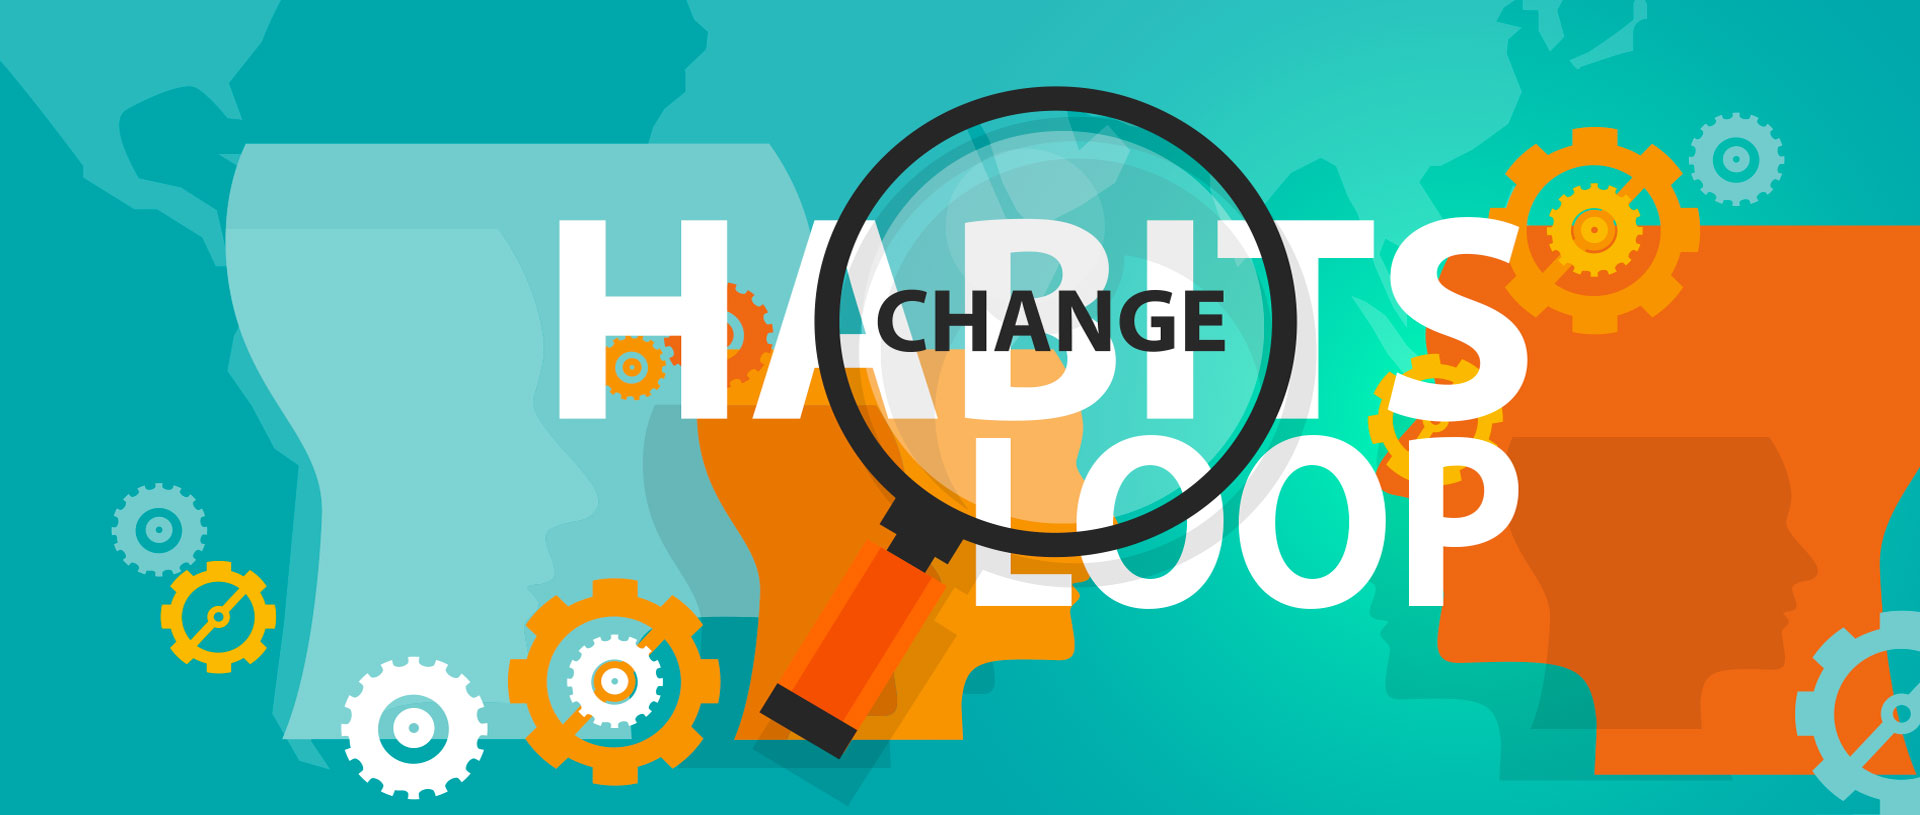 Real Way Of Life The Change Habit Loop